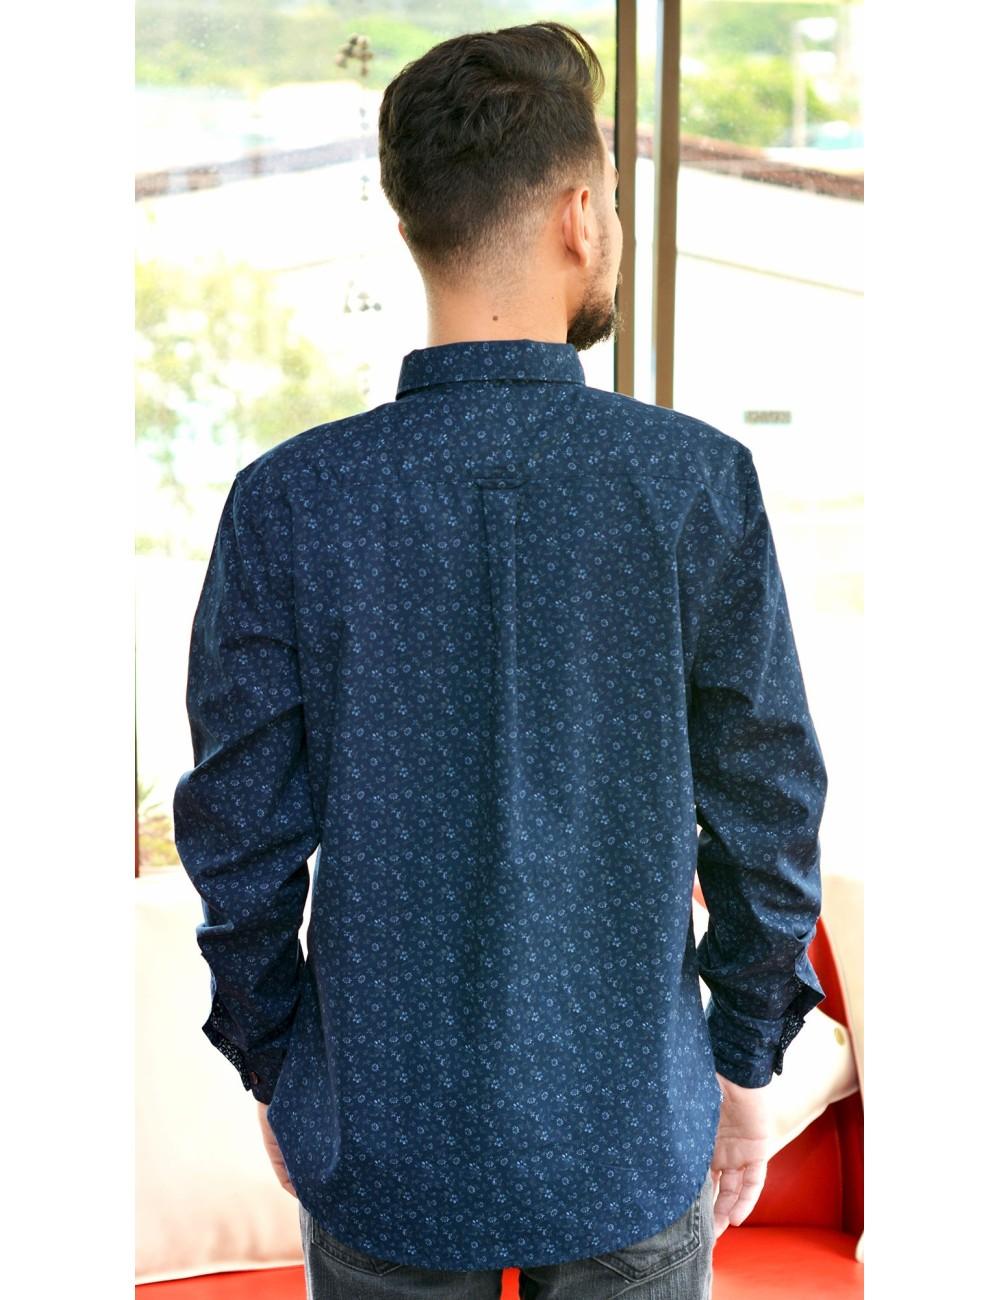 Camisa manga larga azul con estampado flores